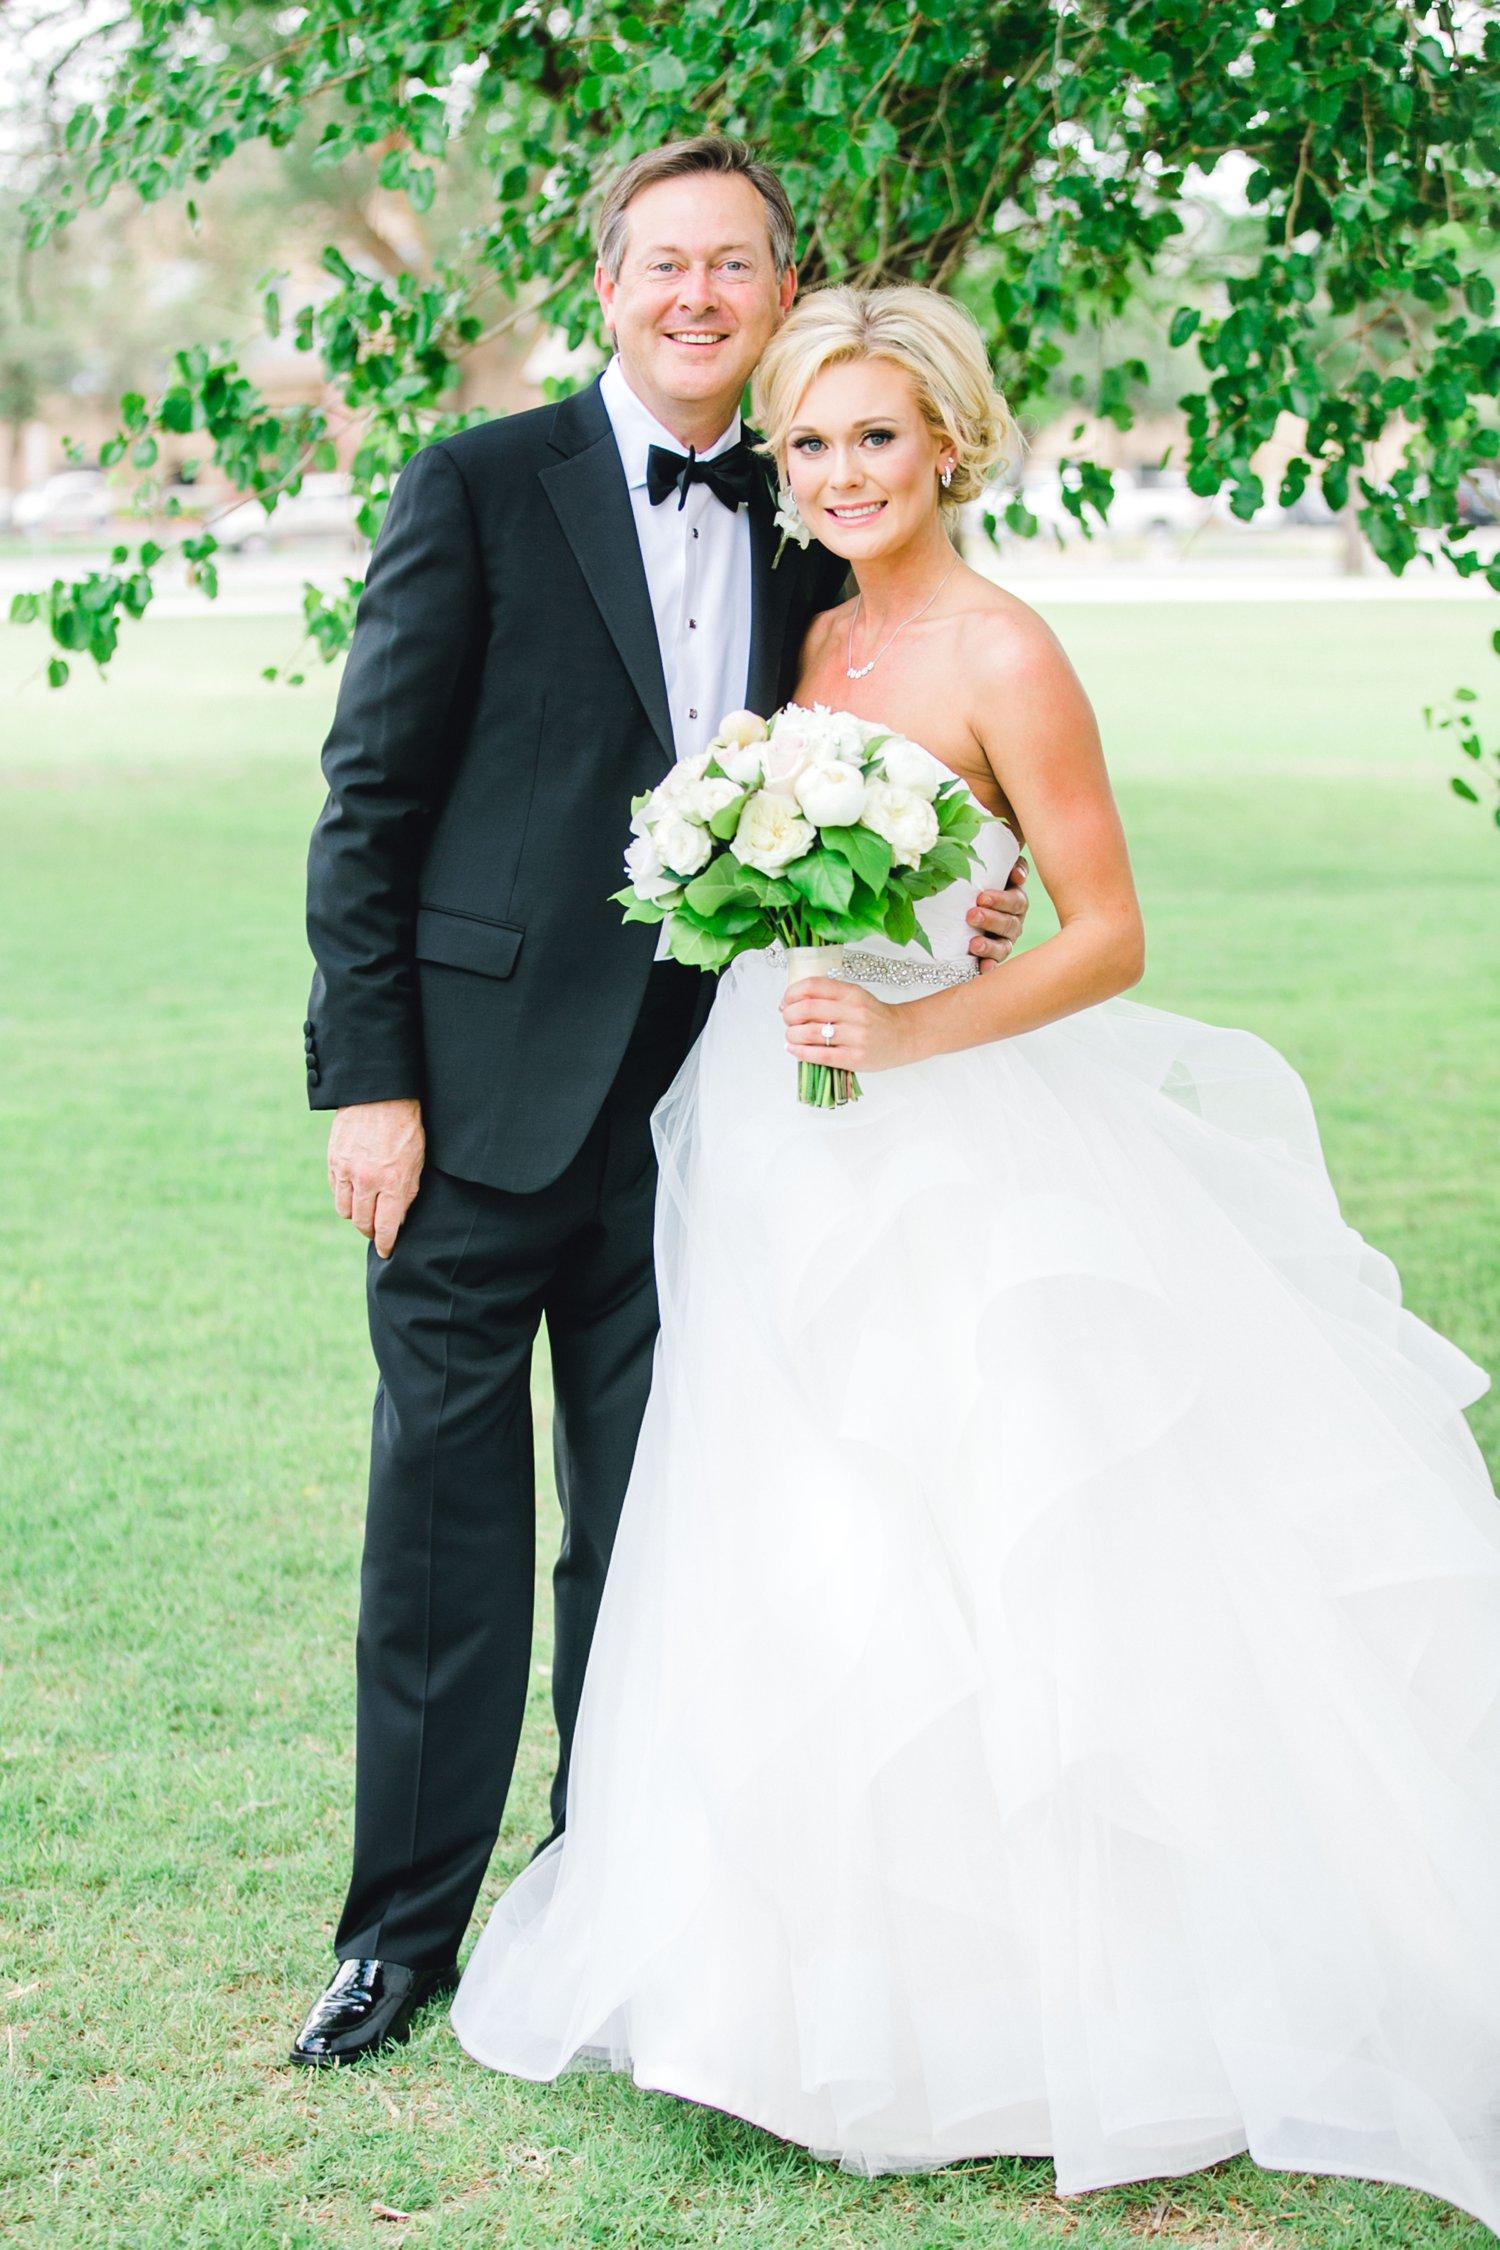 Taylor-and-Brock-Williams-Texas-Tech-University-Merket-Alumni-Center-Lubbock-Photographer-ALLEEJ0023.jpg